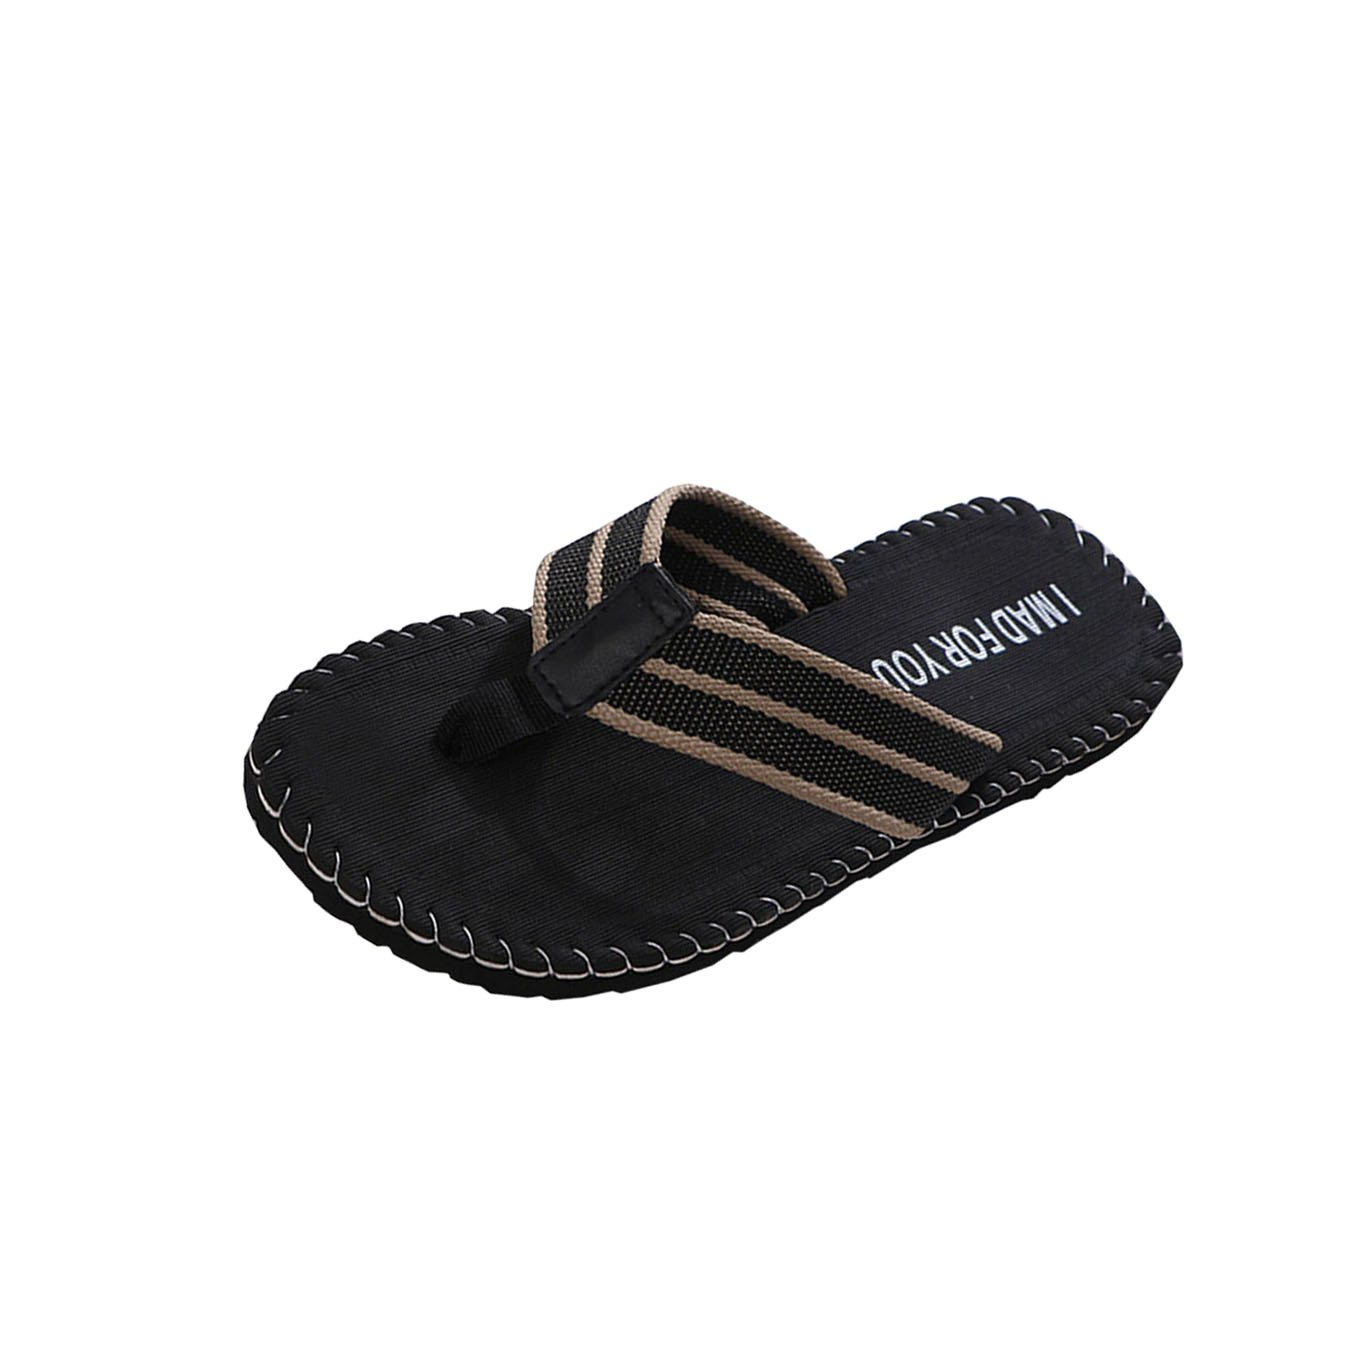 Sunyastor Men Slippers,2019 New Men's Summer Stripe Flip Flops Shoes Sandals Male Slipper Indoor Or Outdoor Beach Flip-Flops Black